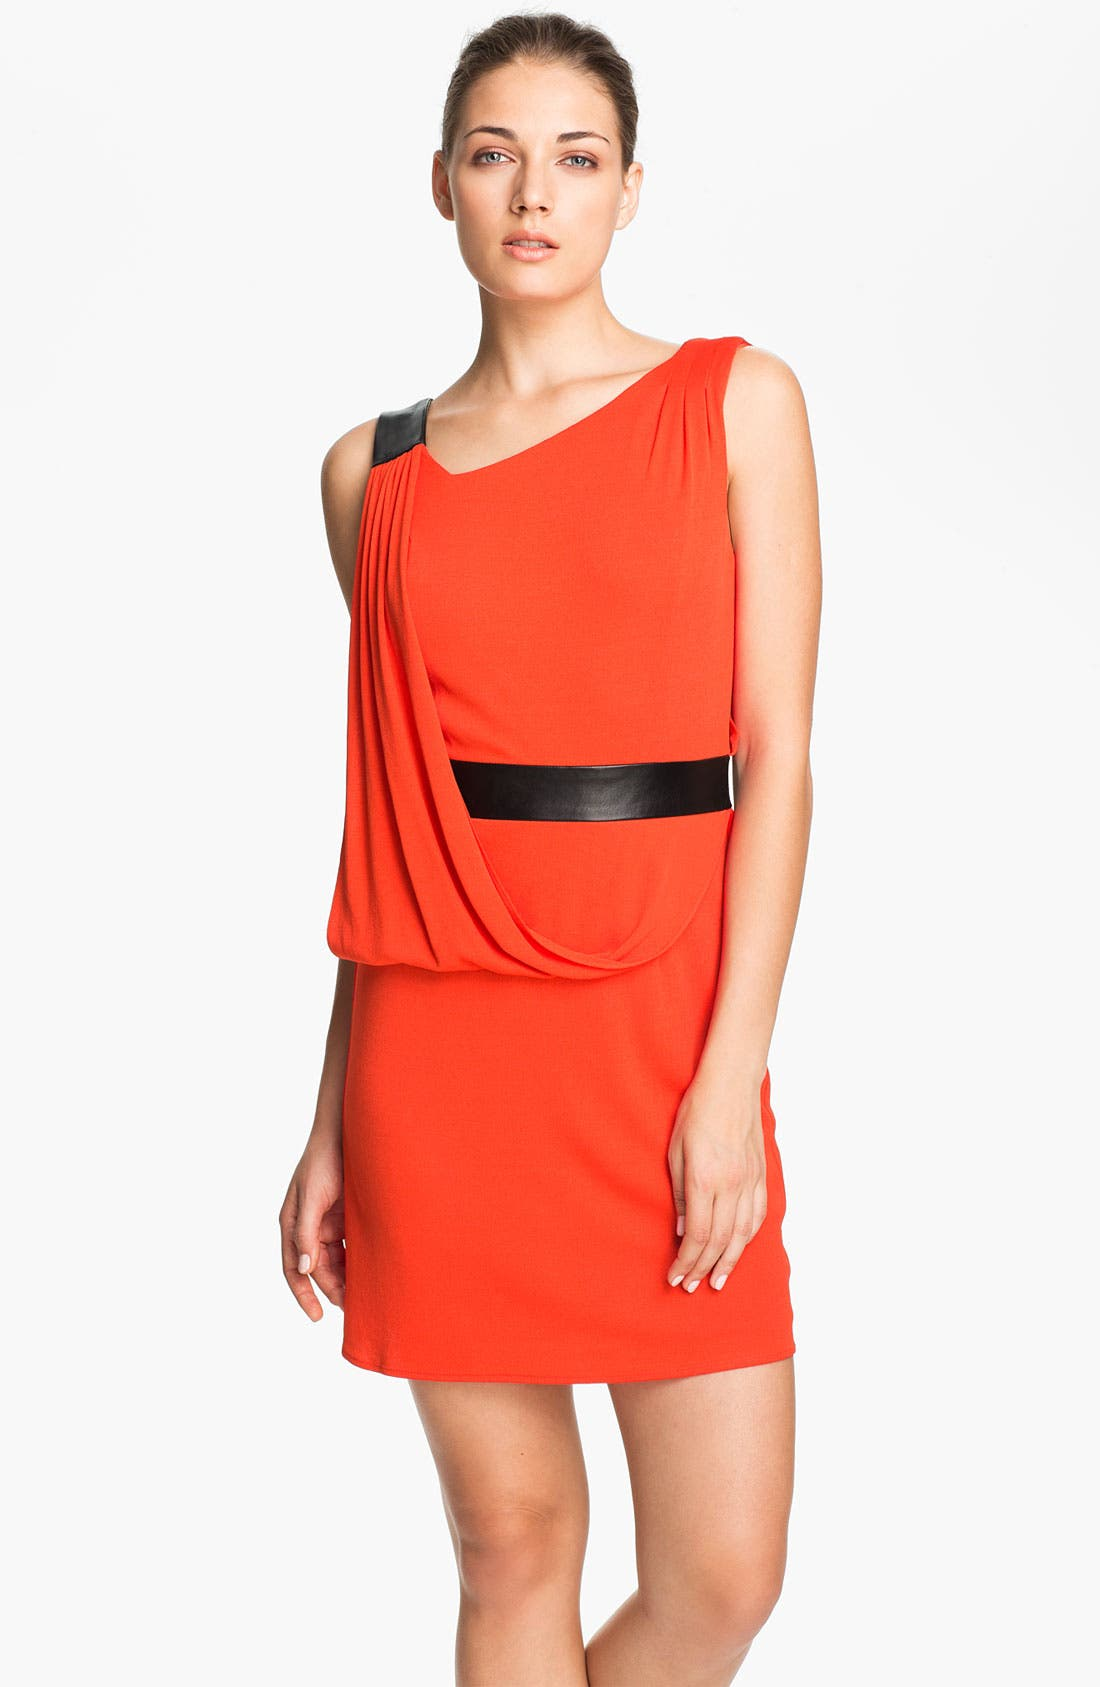 Alternate Image 1 Selected - Milly 'Iris' Knit Sheath Dress